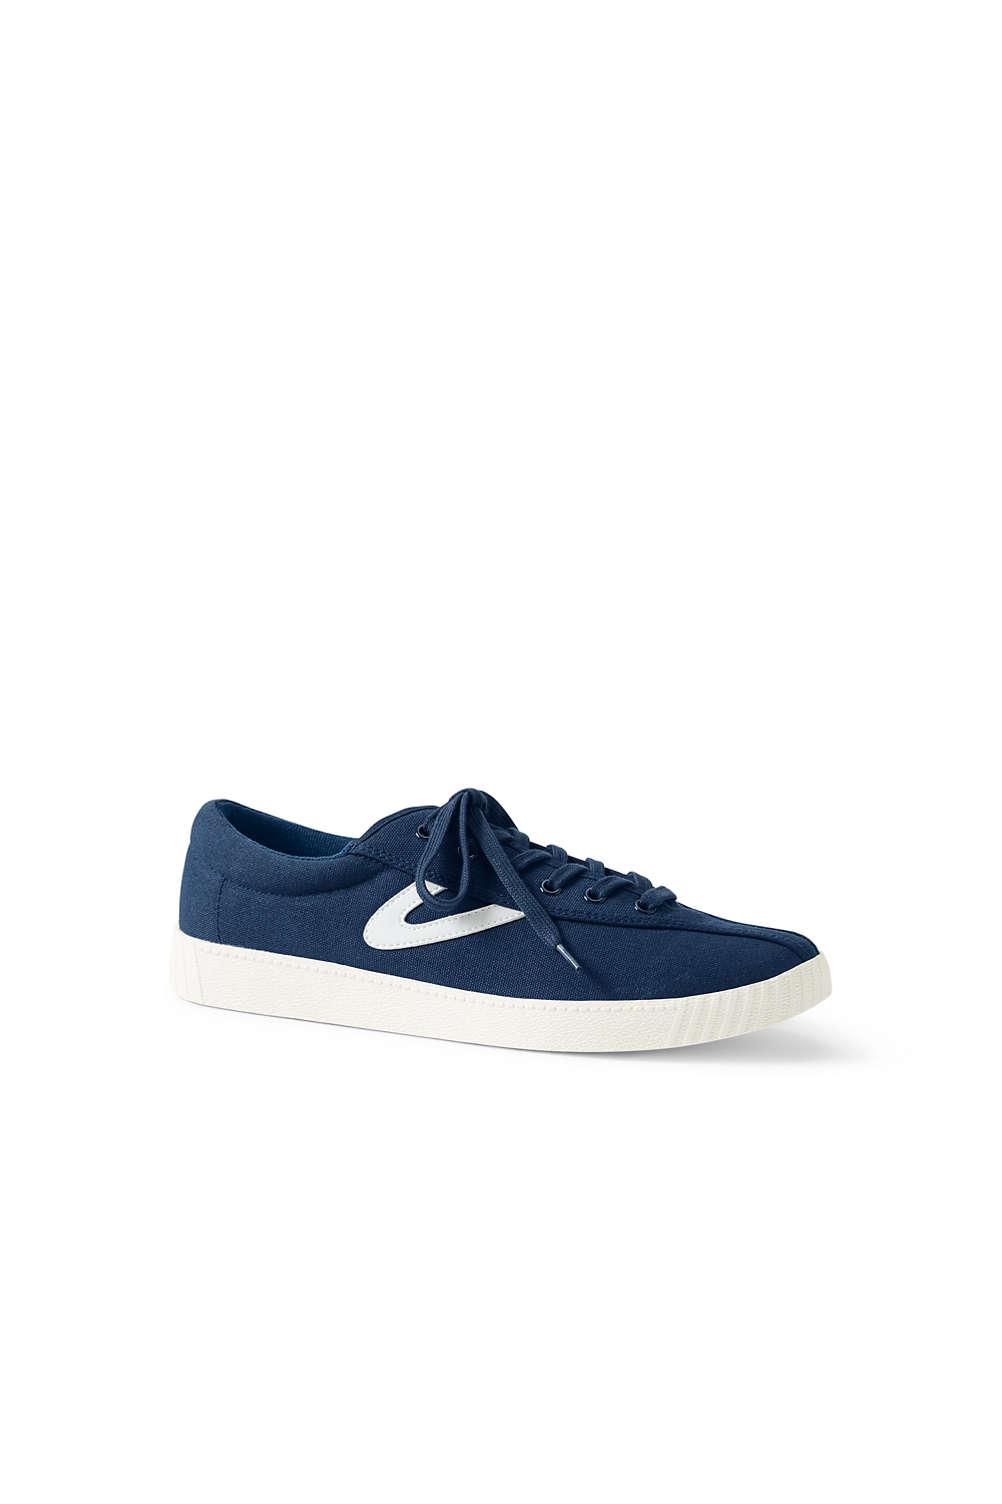 best website 461b7 cb122 Men s Tretorn Nylite Plus Sneakers from Lands  End